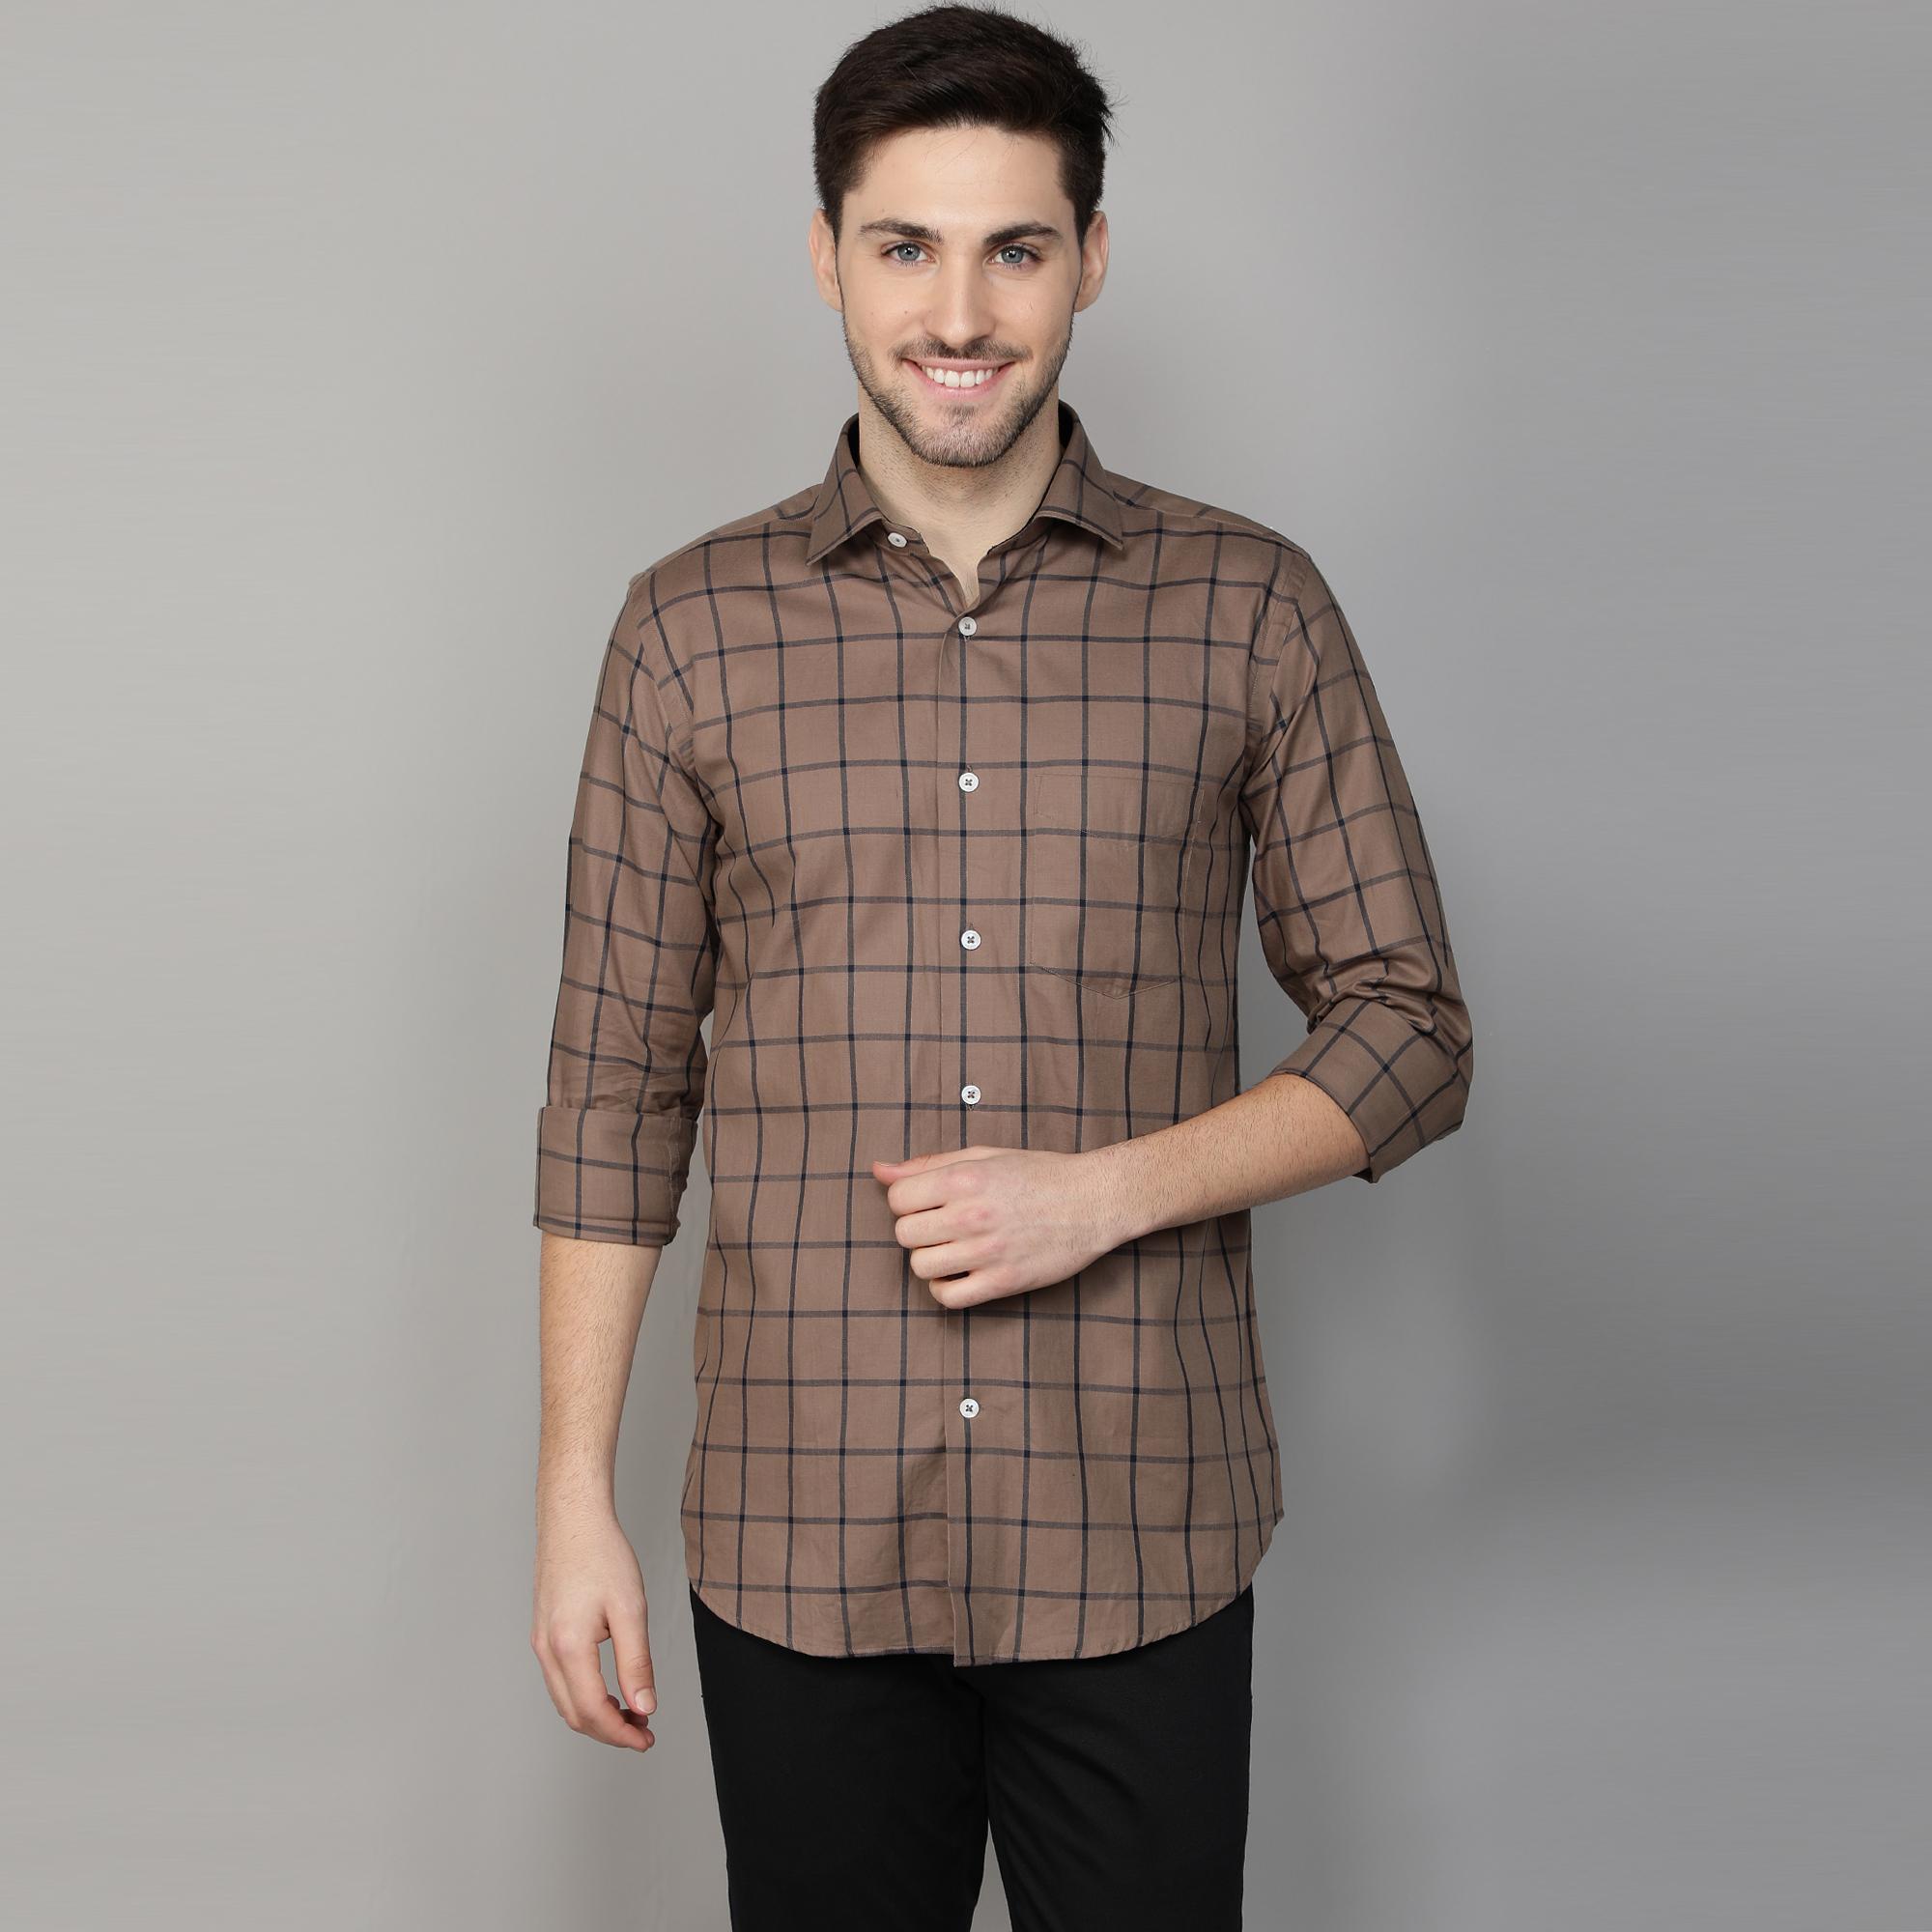 Callino London | Callino London Men's Mouse Smart Fit Checkered Casual Giza Cotton Shirt